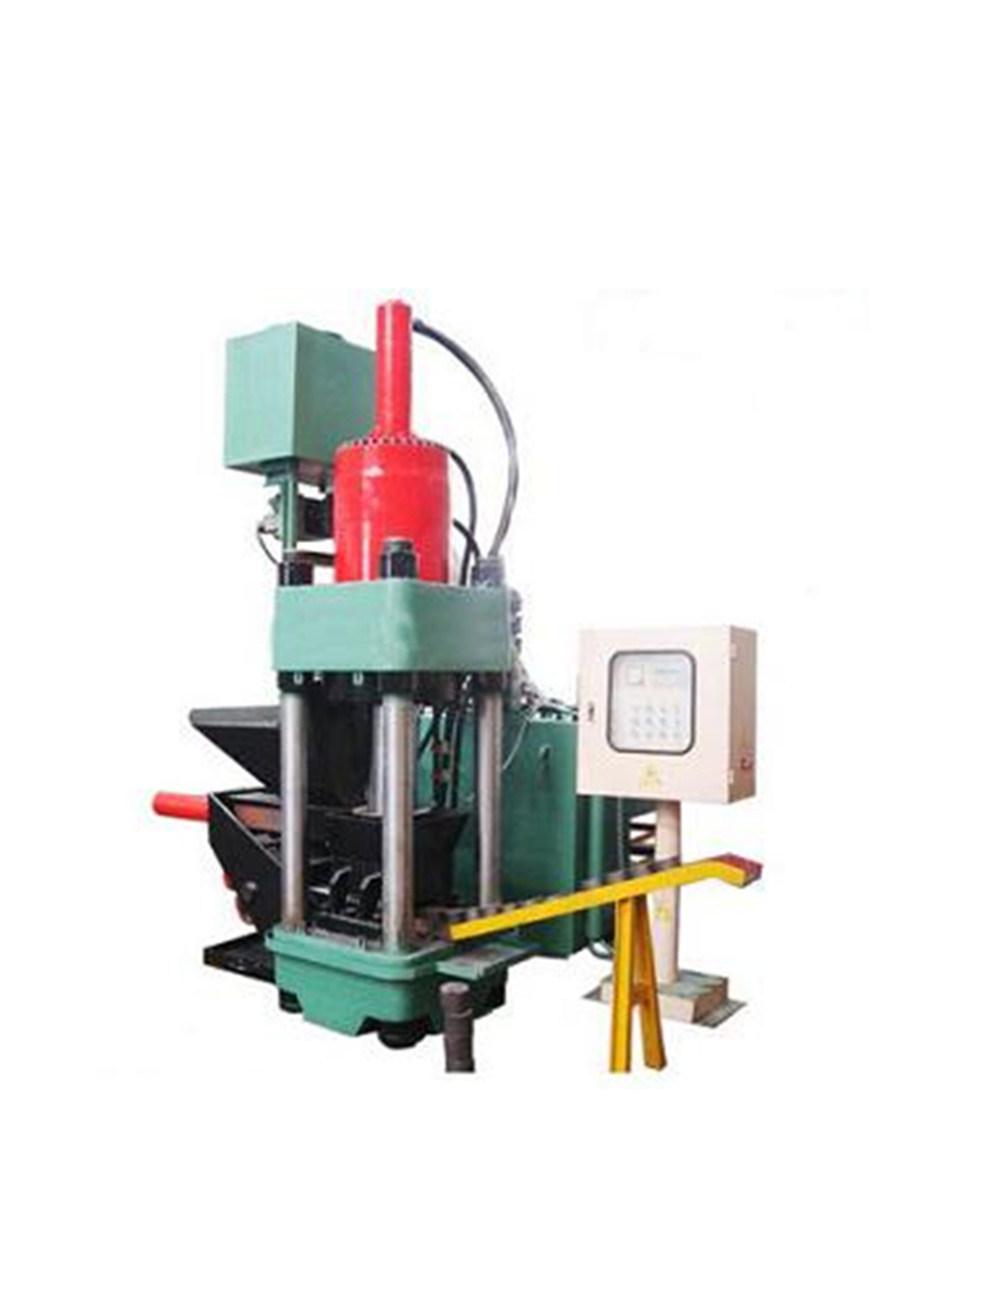 Series of Scrap Metal Briquetting Press